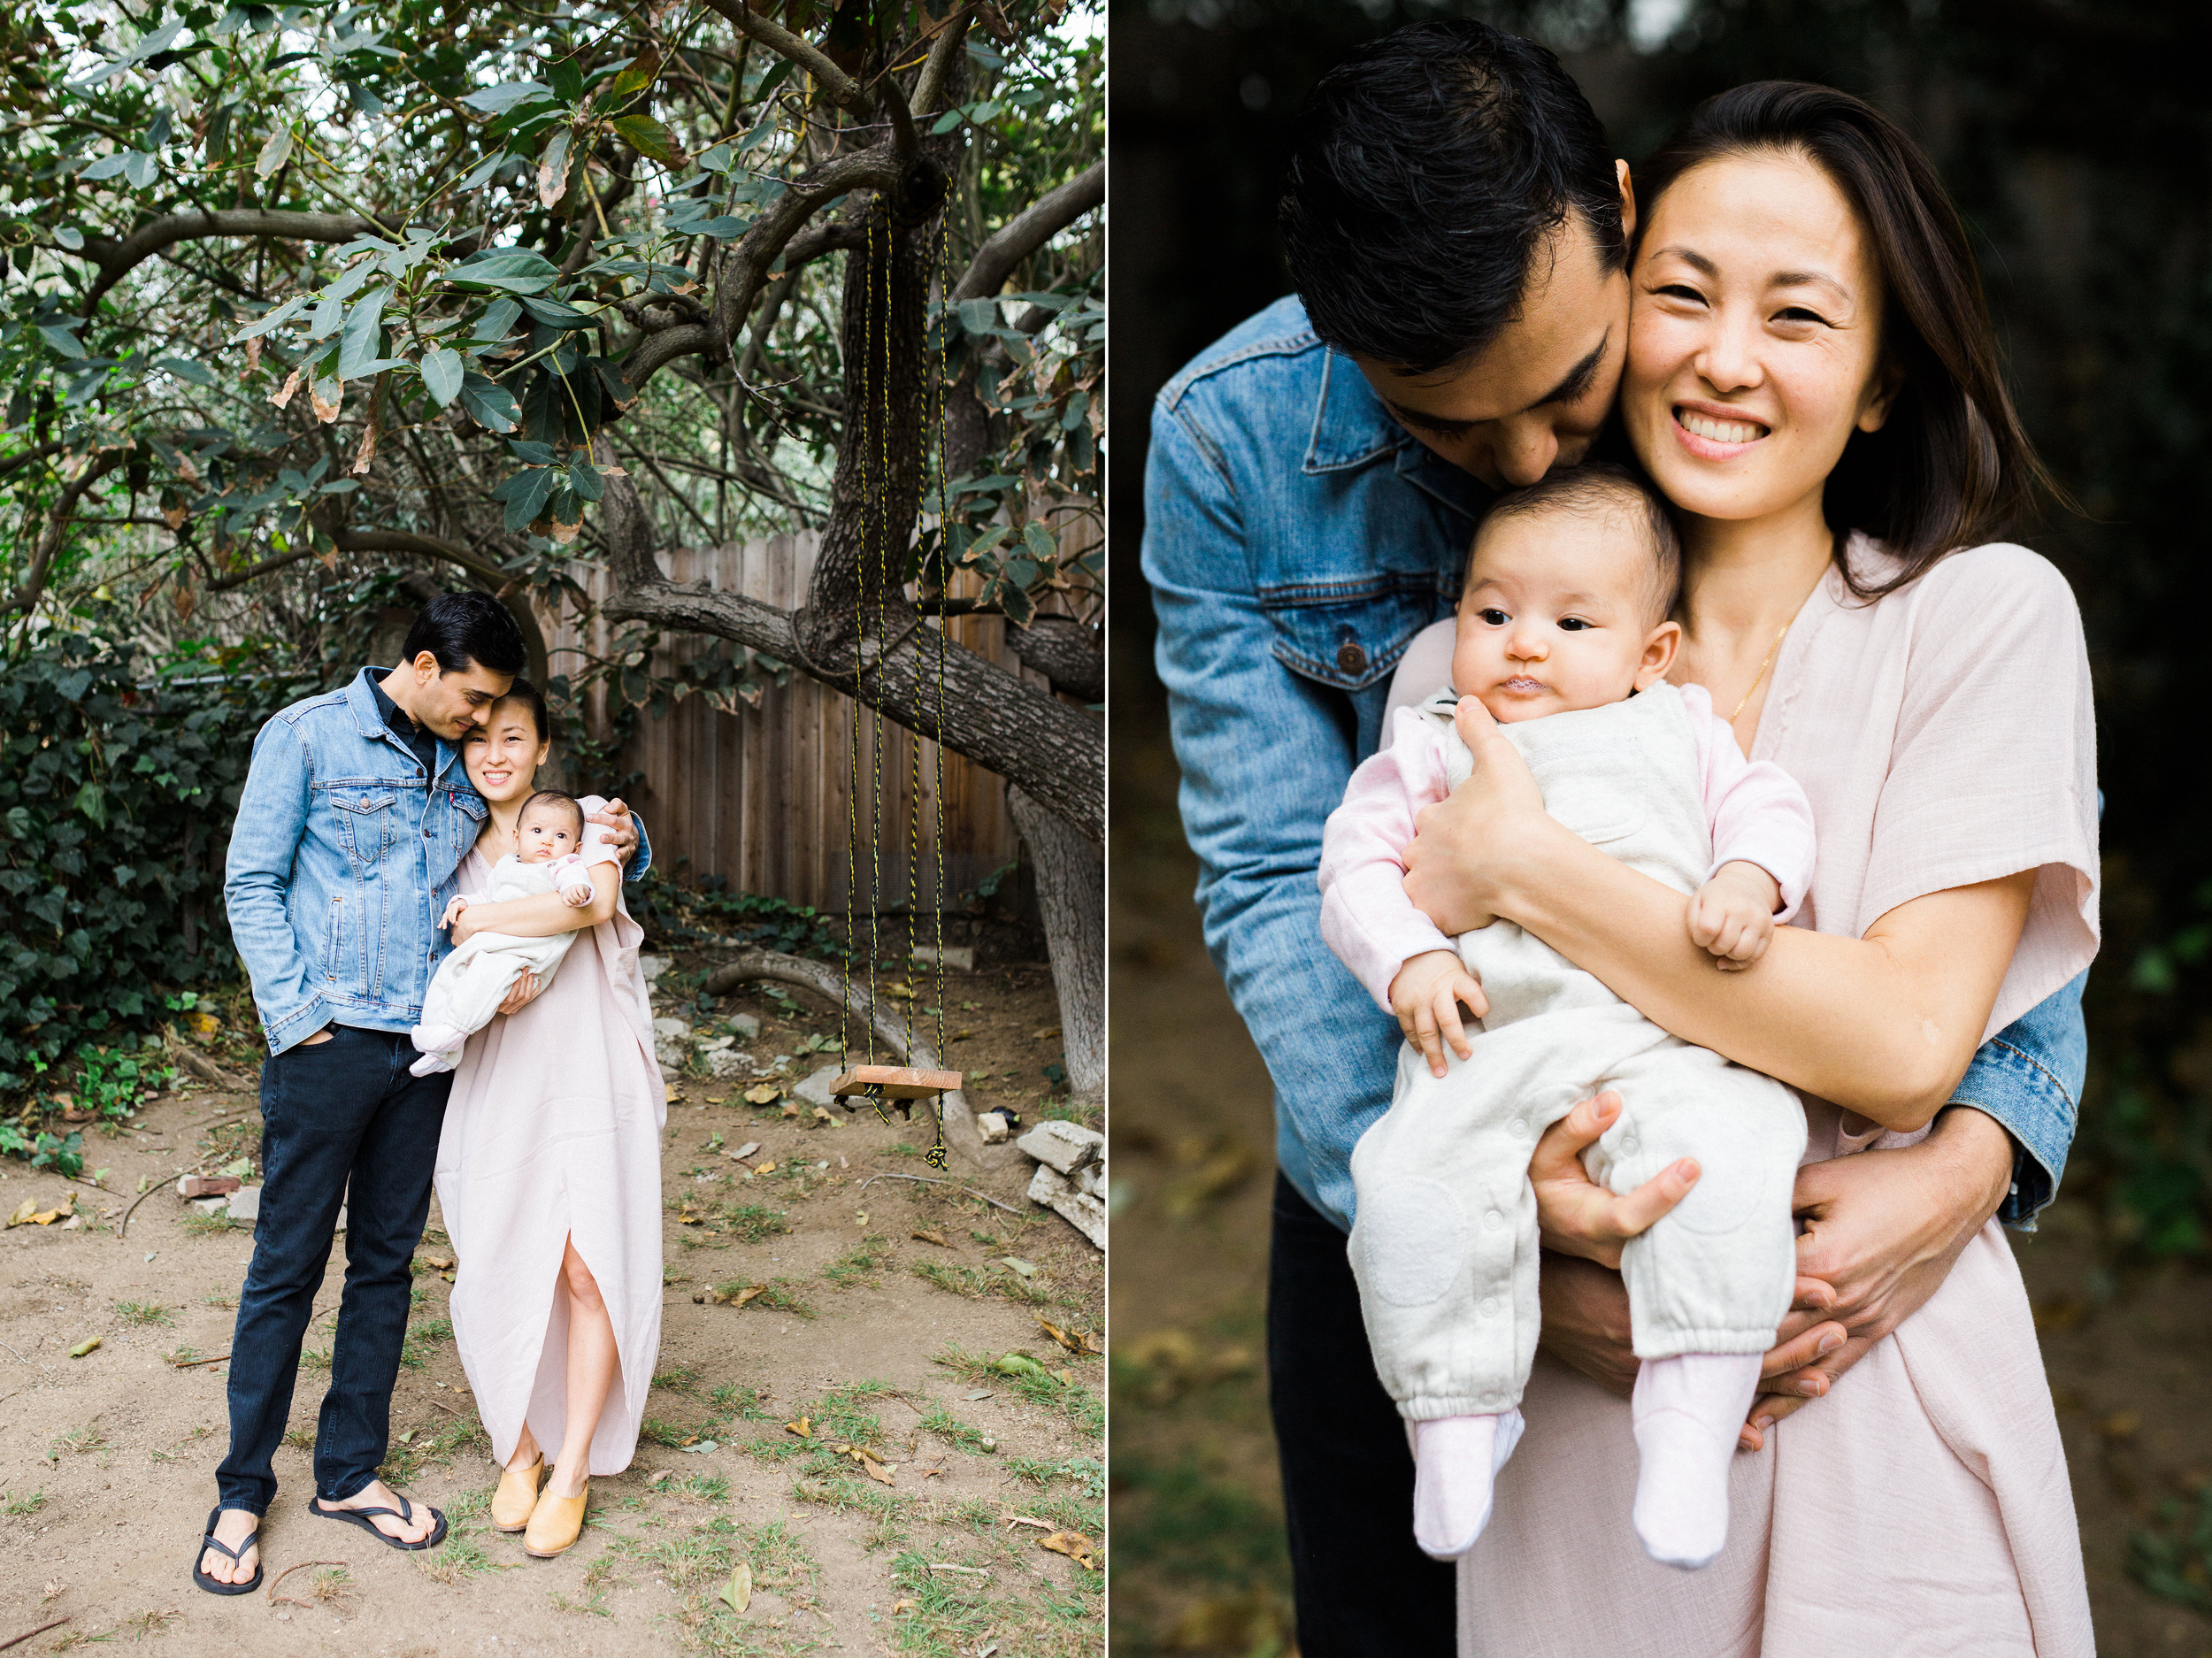 mehana-family-session_la-los-angeles-family-photographer-laurel-canyon_5.jpg